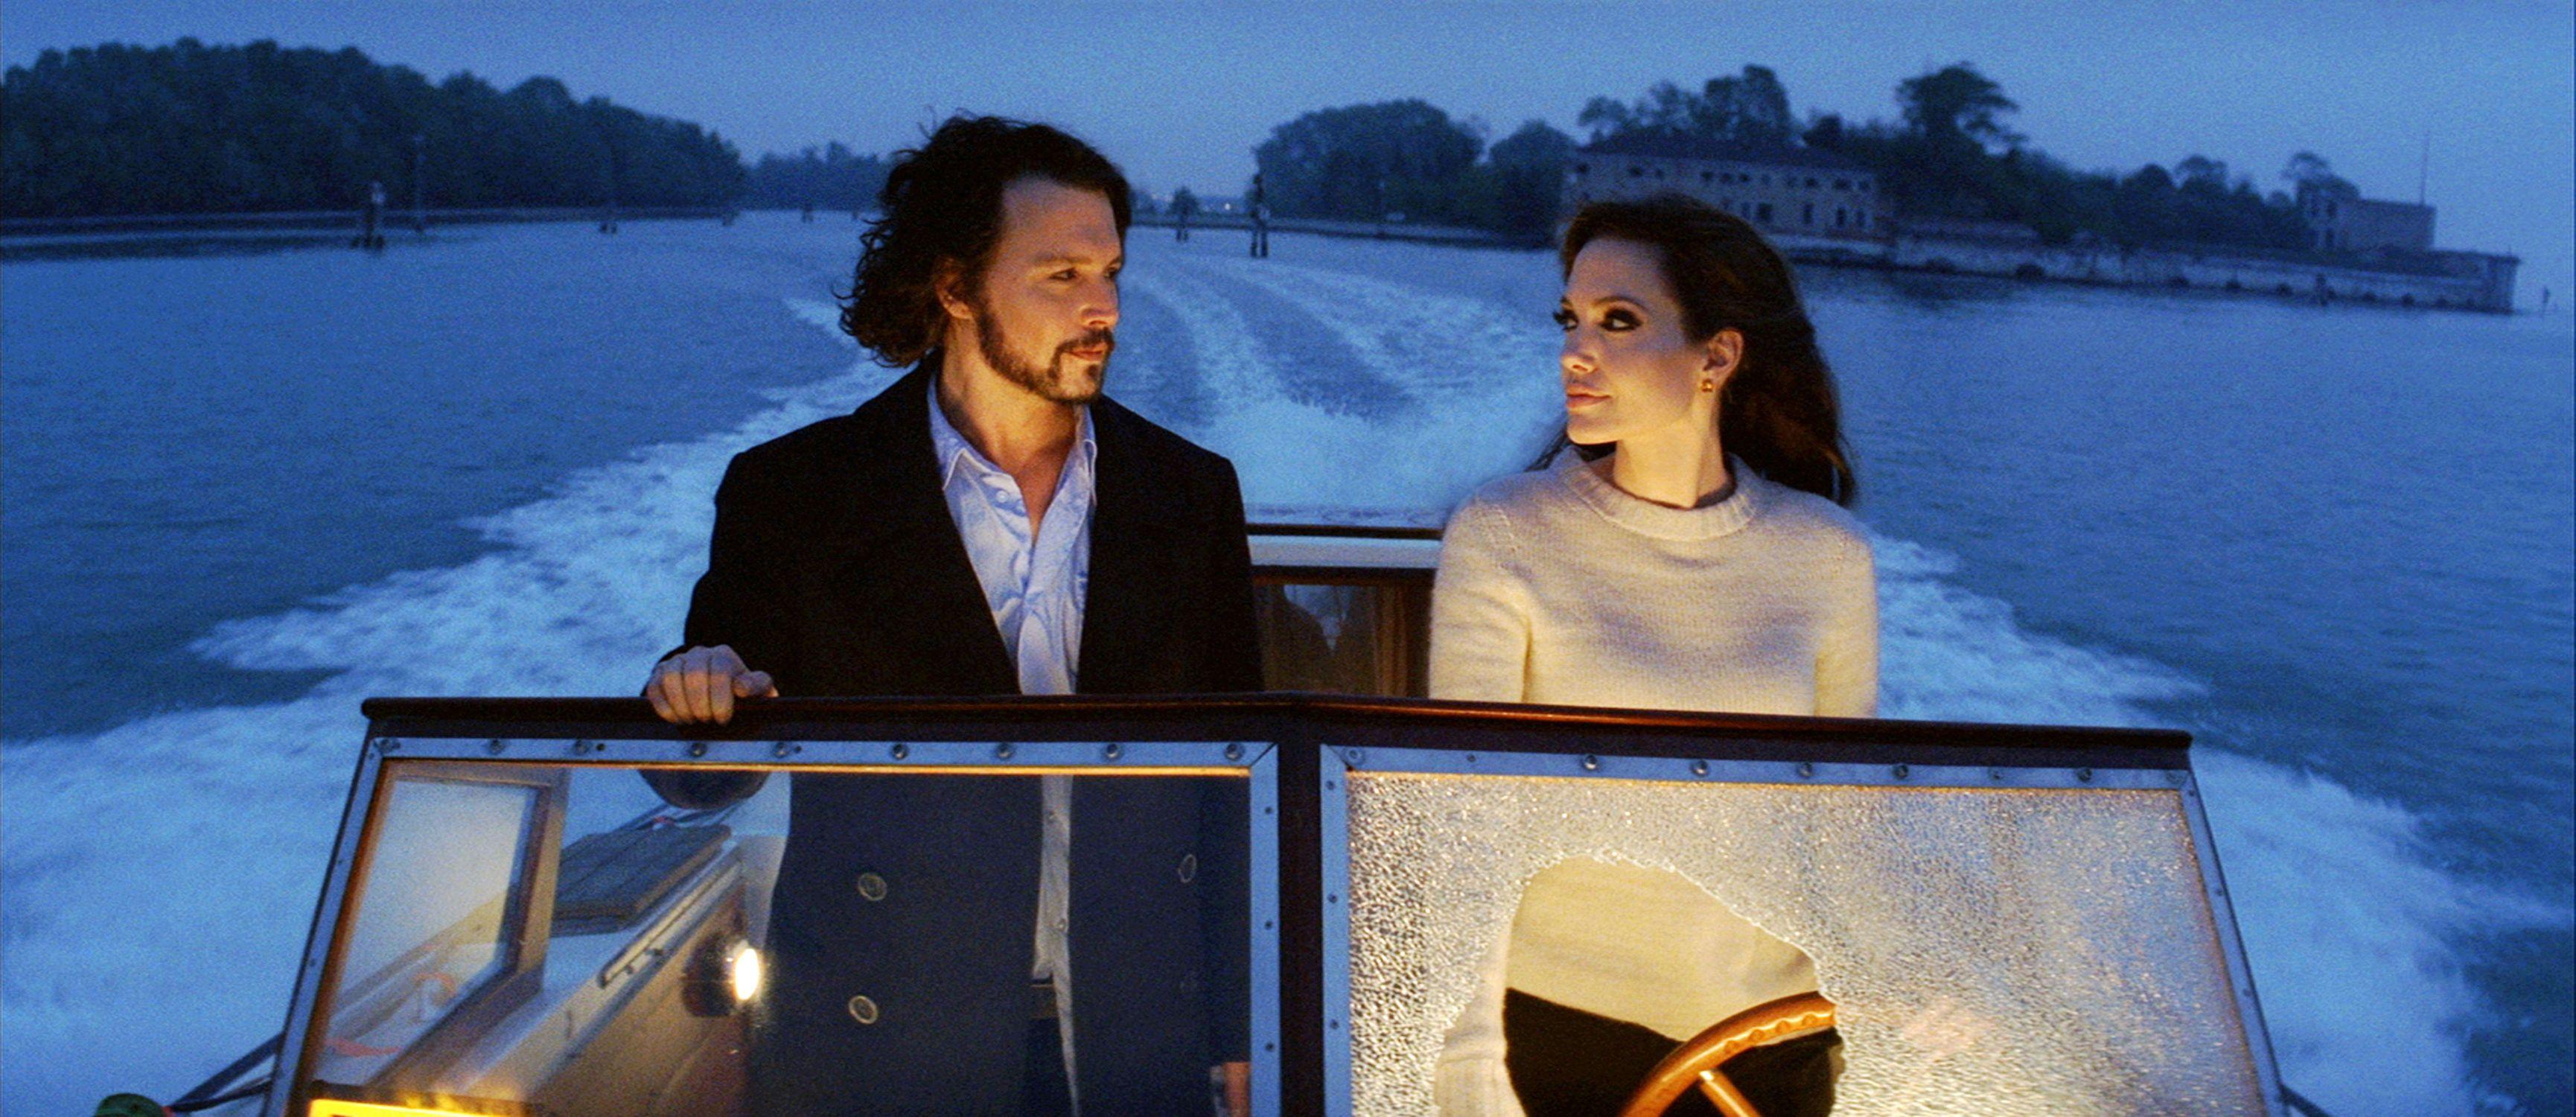 The Tourist22 Jpg 3 460 1 500 Pixels Johnny Depp Angelina Jolie